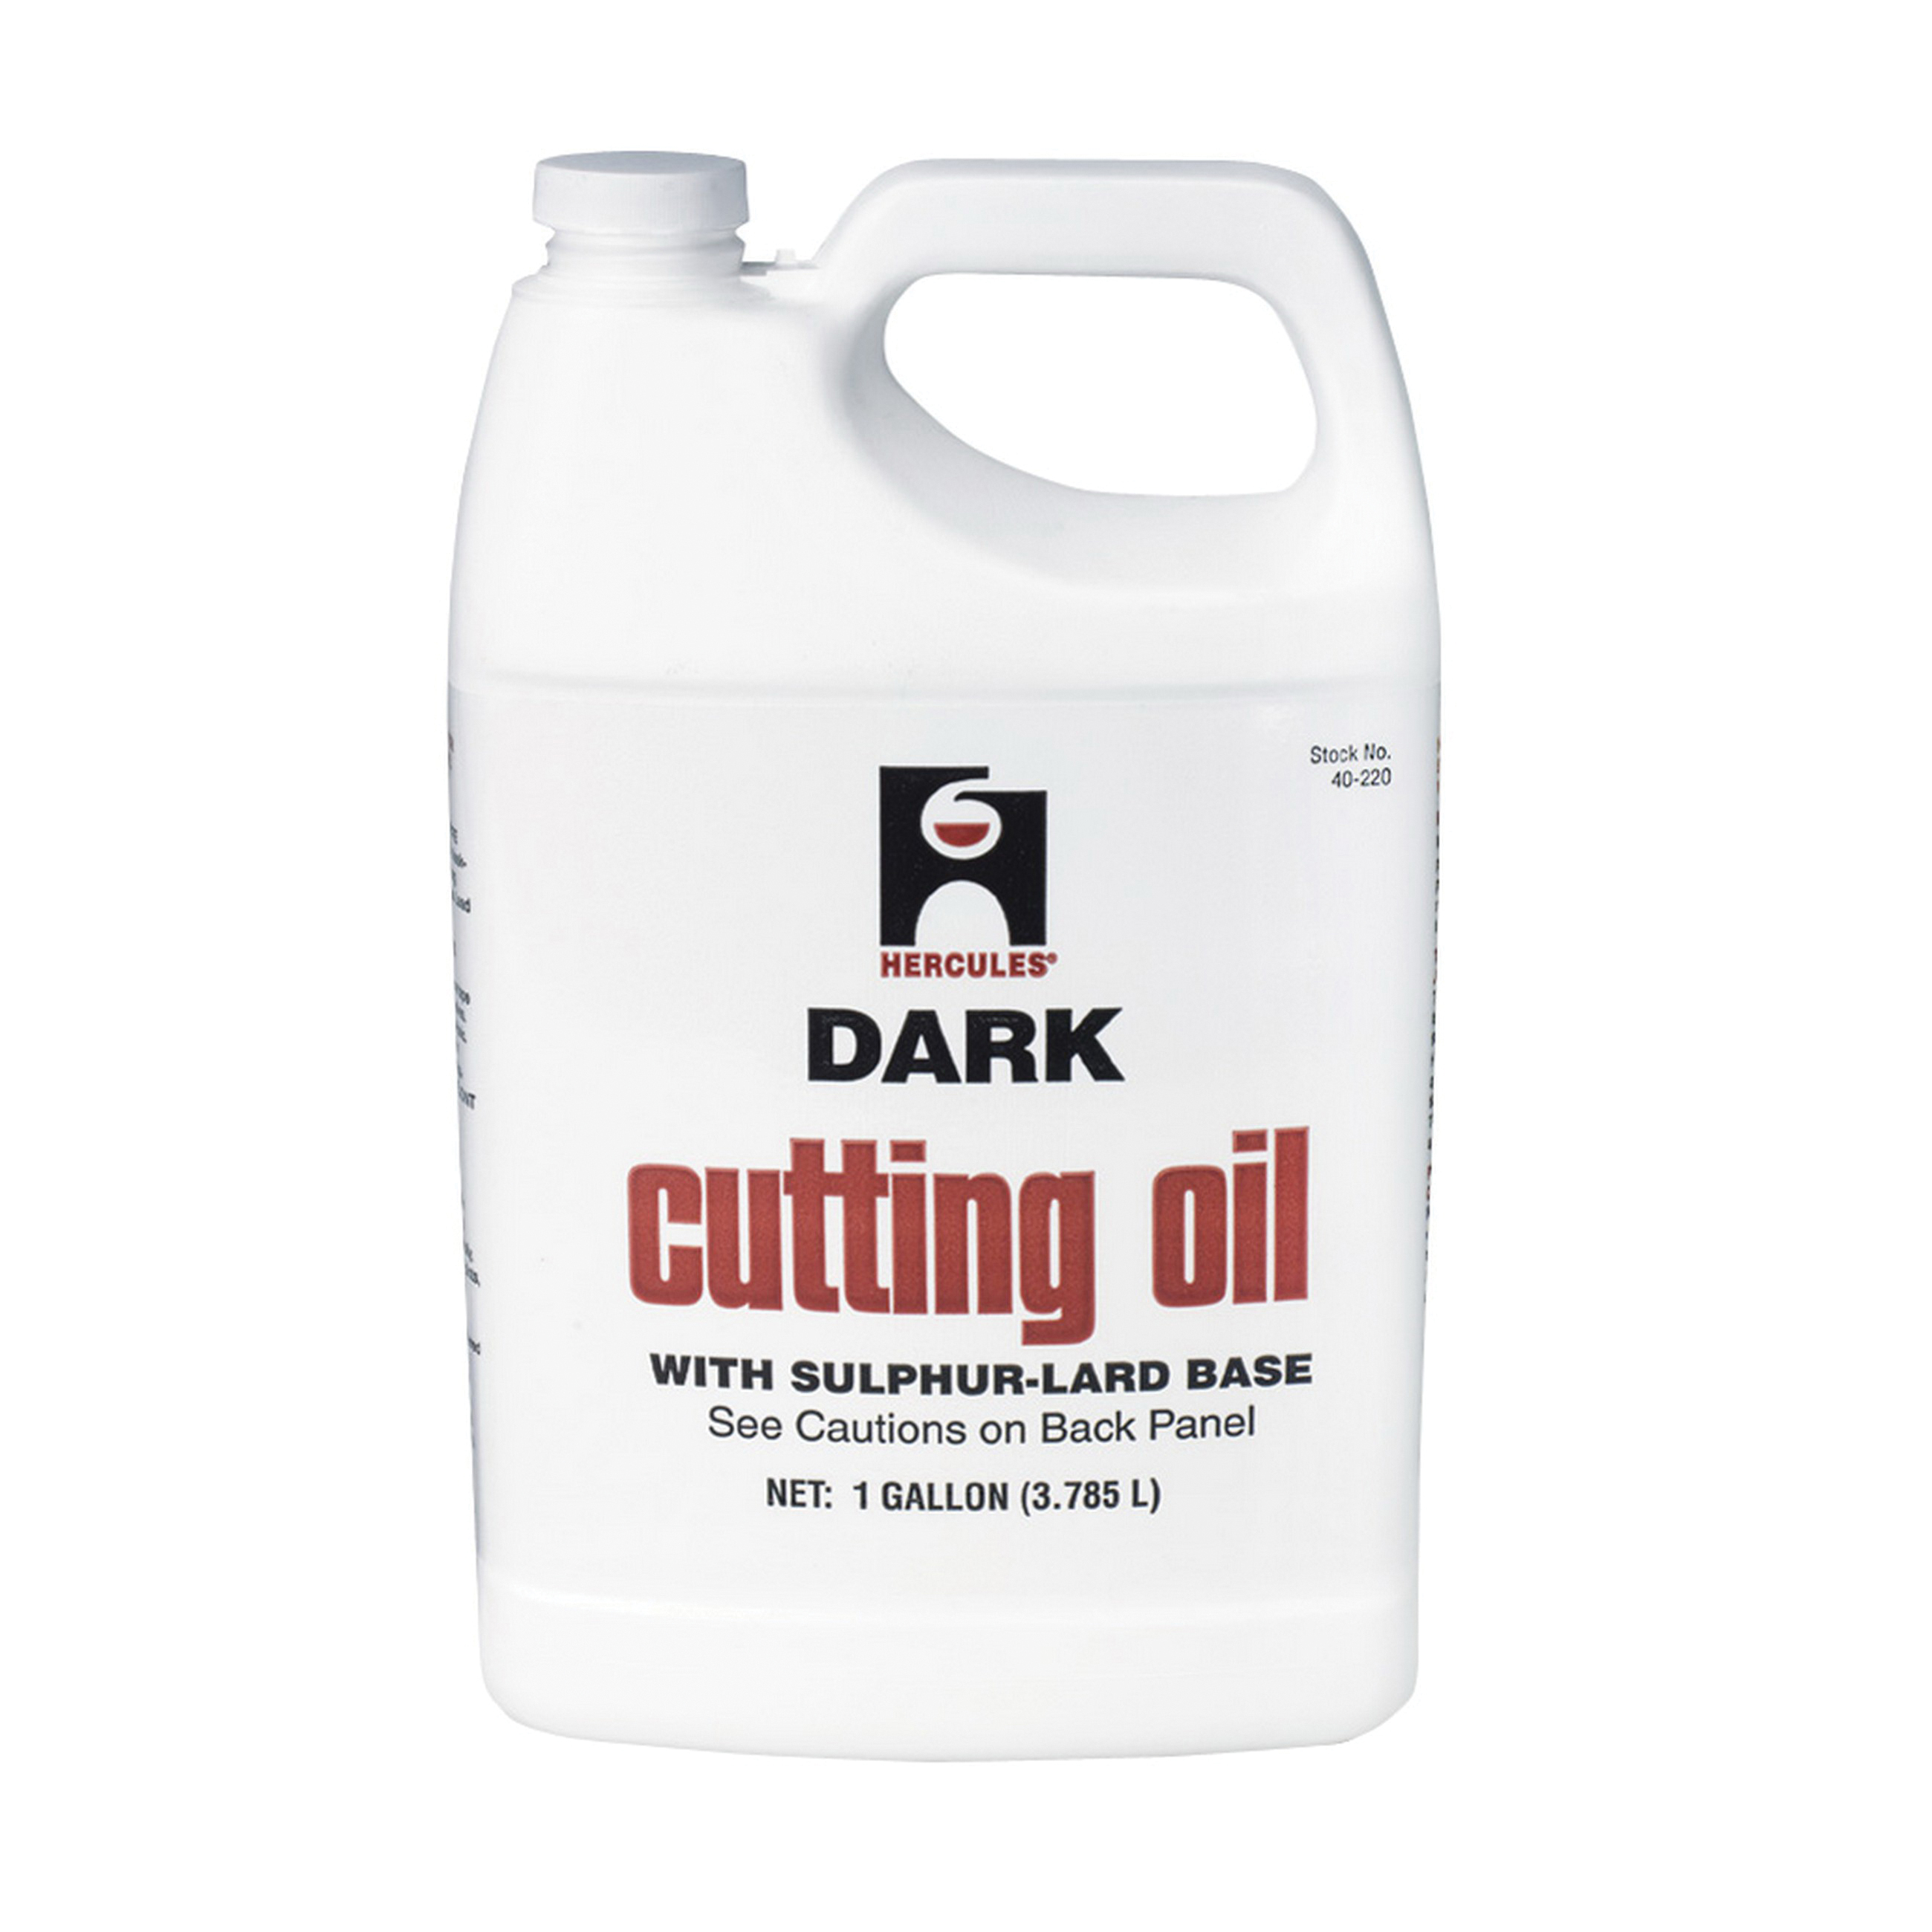 Hercules® 40220 Cutting Oil, 1 gal, Amber Liquid, Dark Brownish, Petroleum